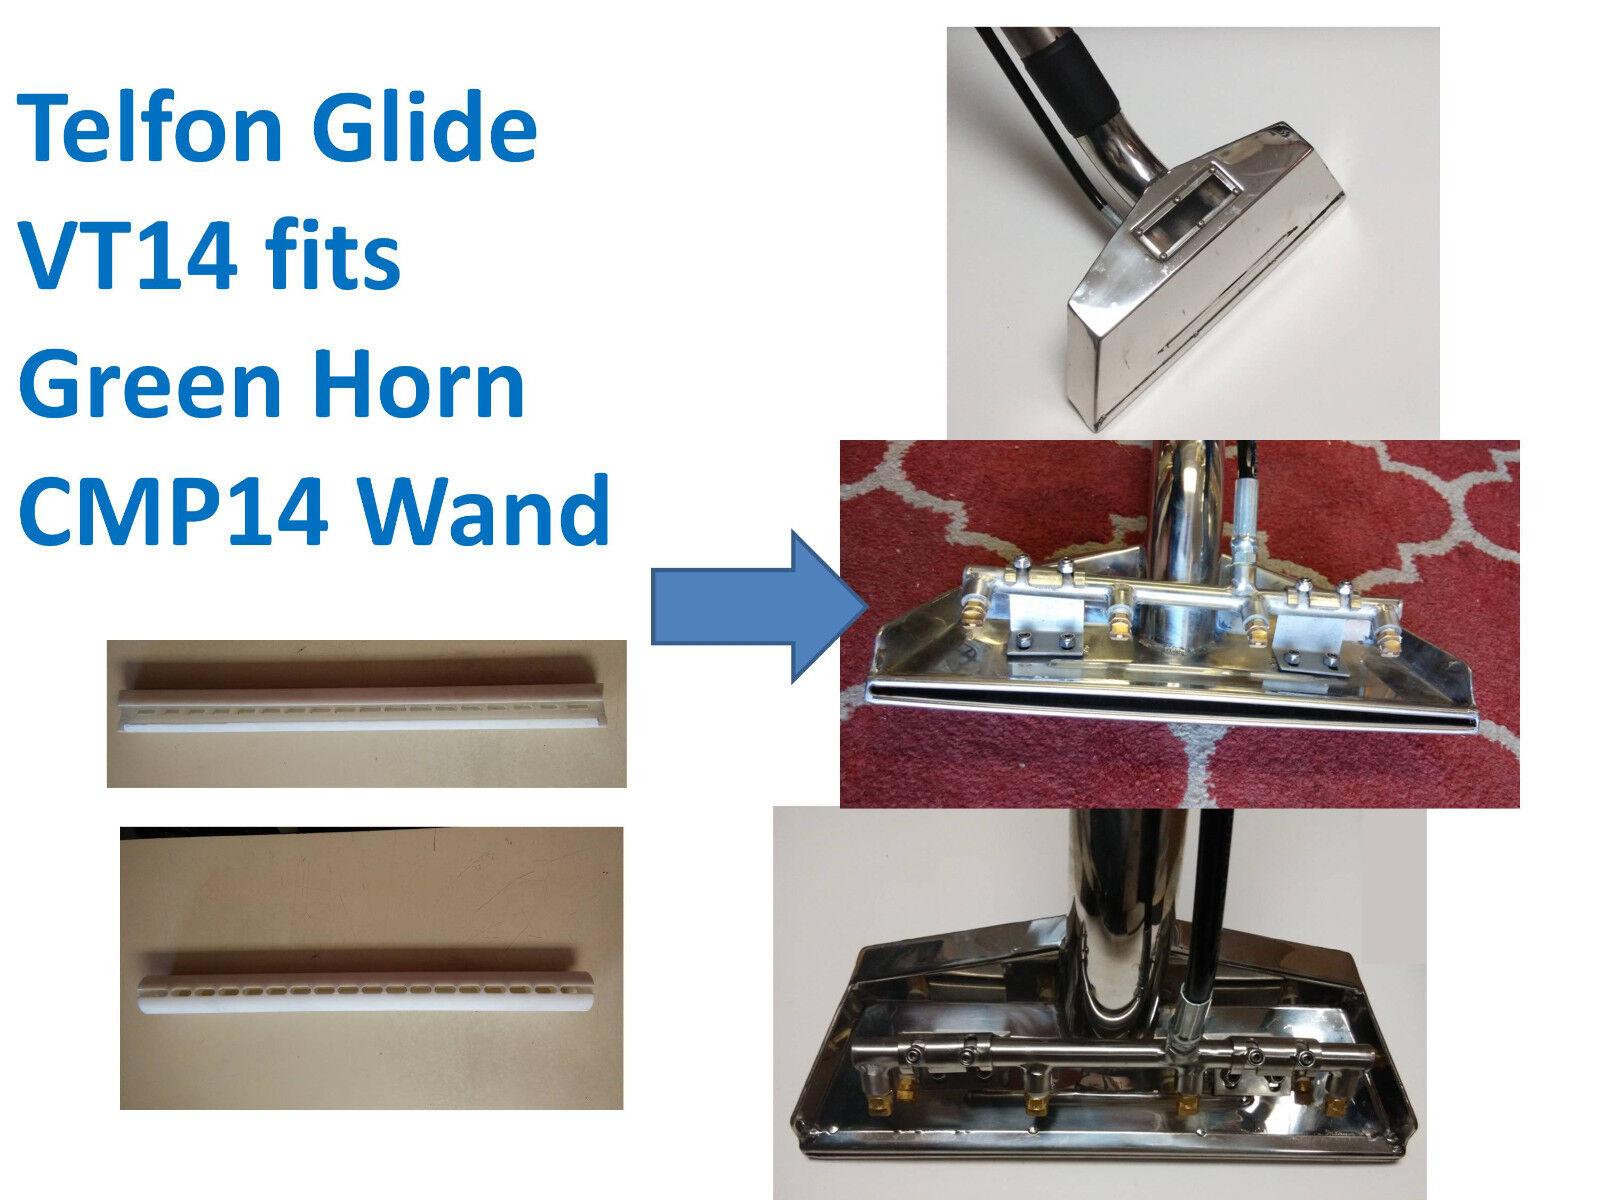 14inch Telfon Glide for CMP VT14 Green Horn Carpet Cleaning